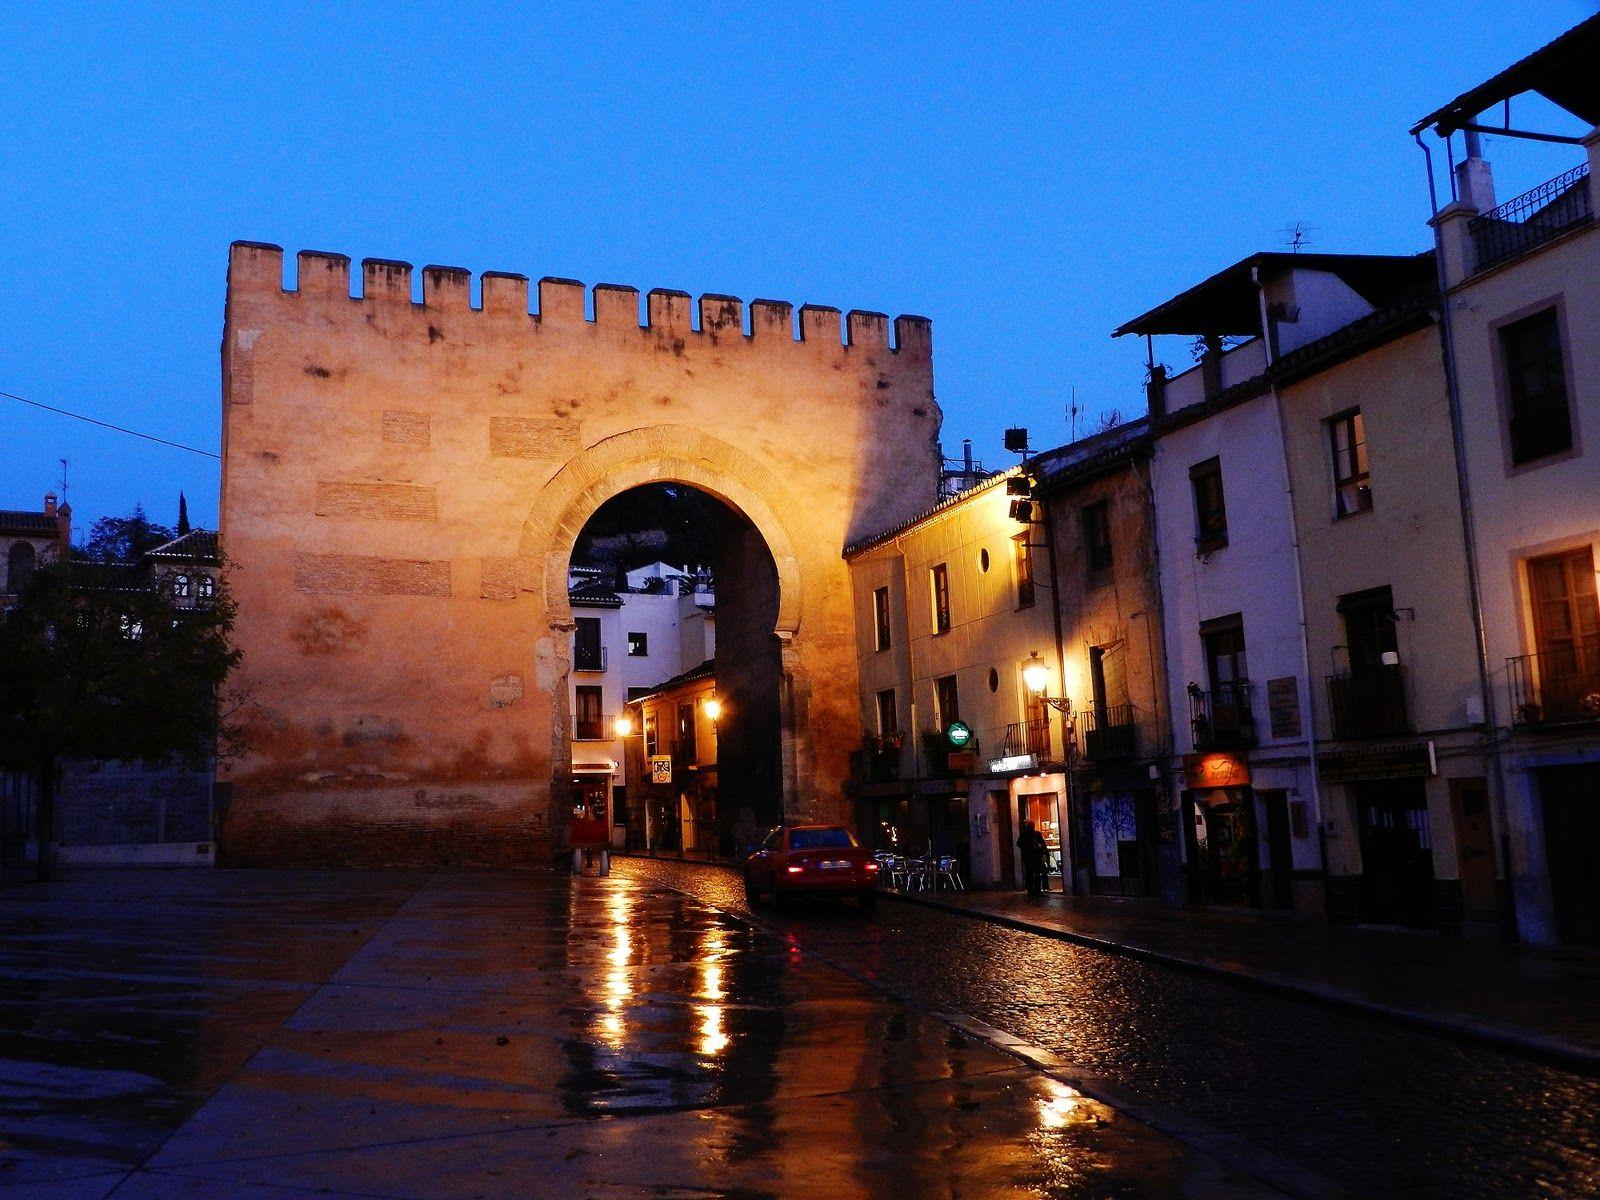 Puerta de Elvira, Plaza del Triunfo. Granada, Spain.